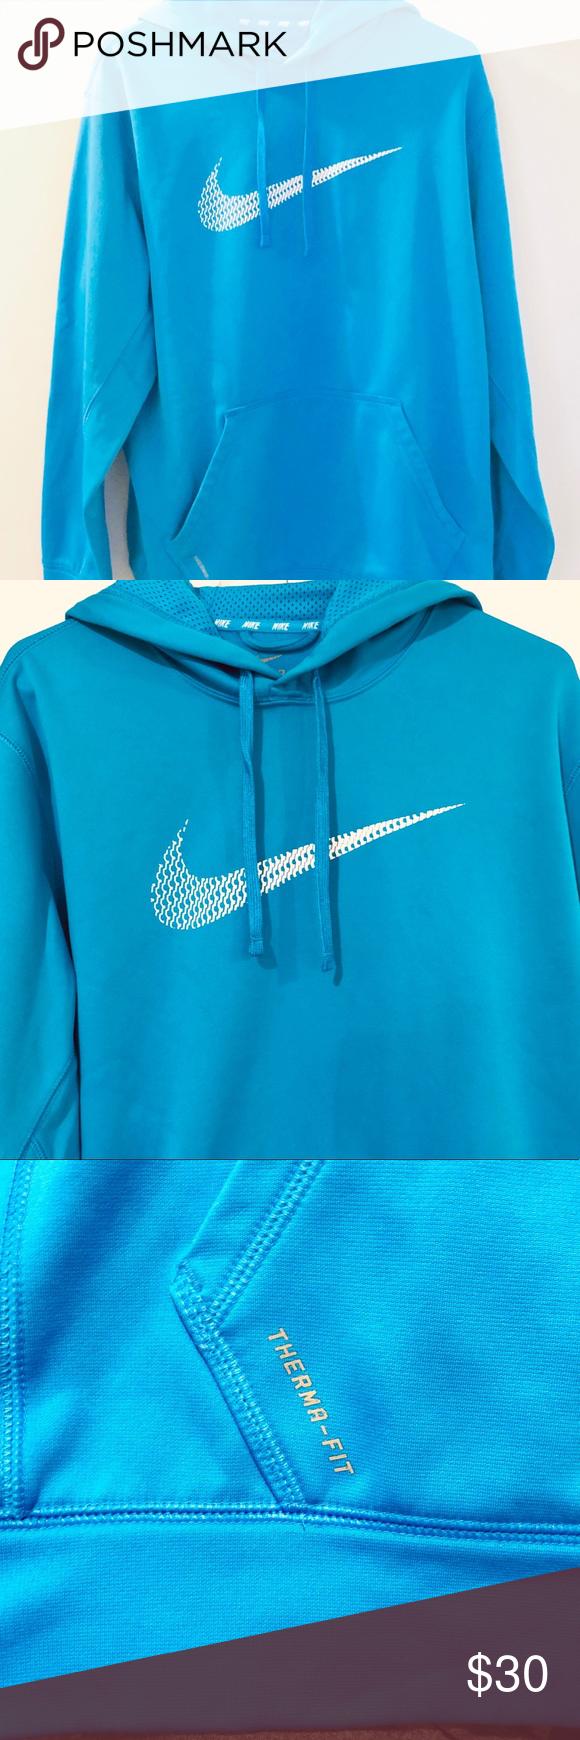 Nike Thermafit Aqua Blue Notch Neck Hoodie Excellent Used Condition Like New Nike Aqua Blue White Therma Fit Notch Neck Clothes Design Neck Hoodie Hoodies [ 1740 x 580 Pixel ]